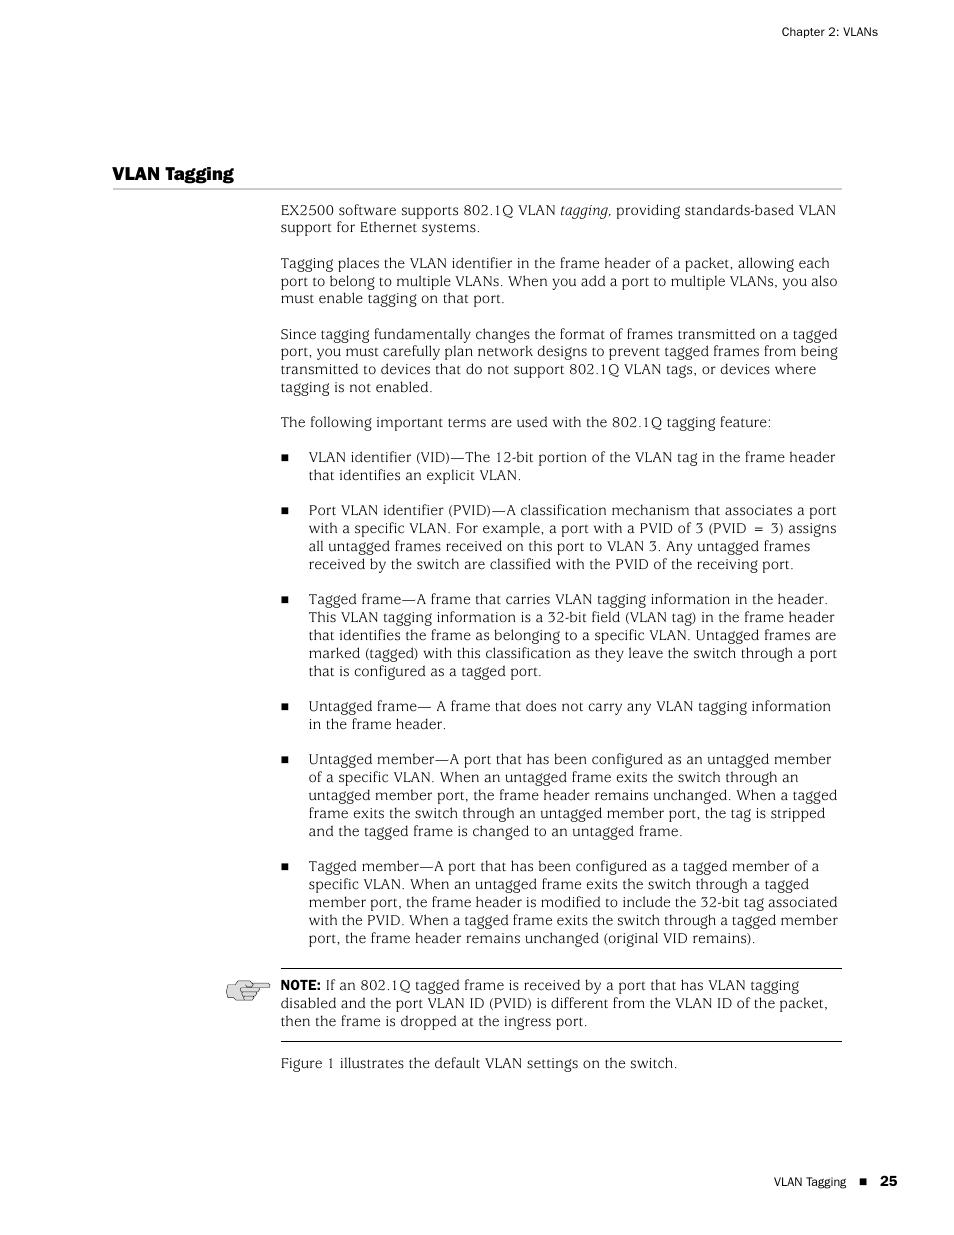 Vlan tagging | Juniper Networks EX2500 User Manual | Page 39 / 106